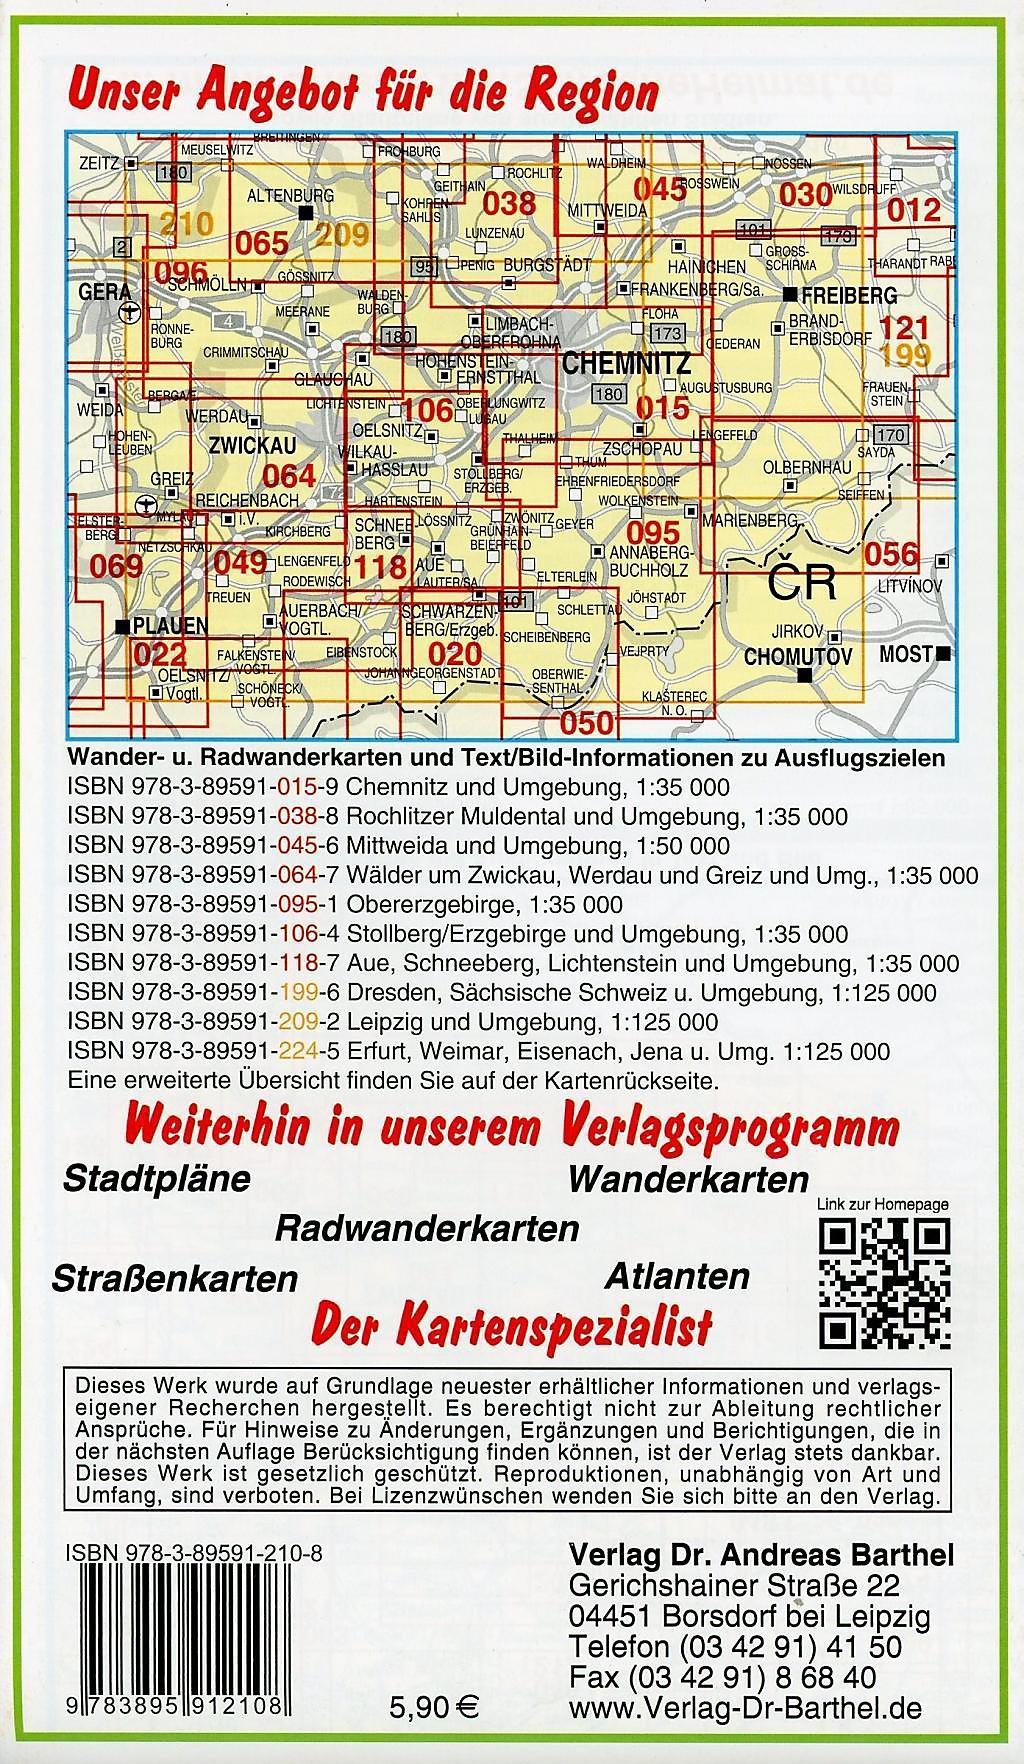 Karte Chemnitz Und Umgebung.Doktor Barthel Karte Chemnitz Erzgebirge Und Umgebung Buch